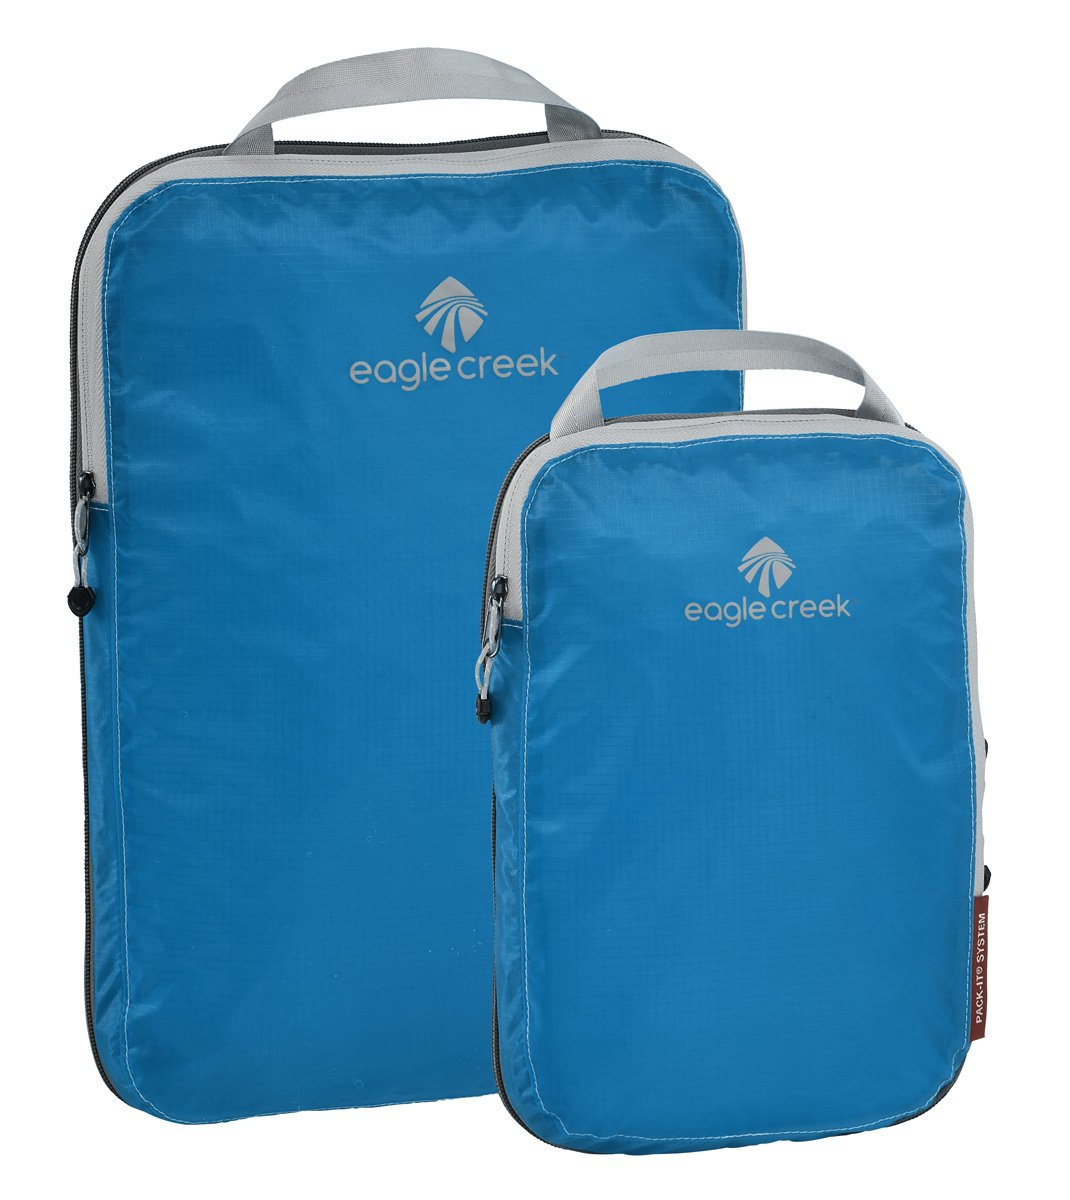 Eagle Creek Travel Gear Pack-it Specter Compression Cube Set, Brilliant Blue, One Size